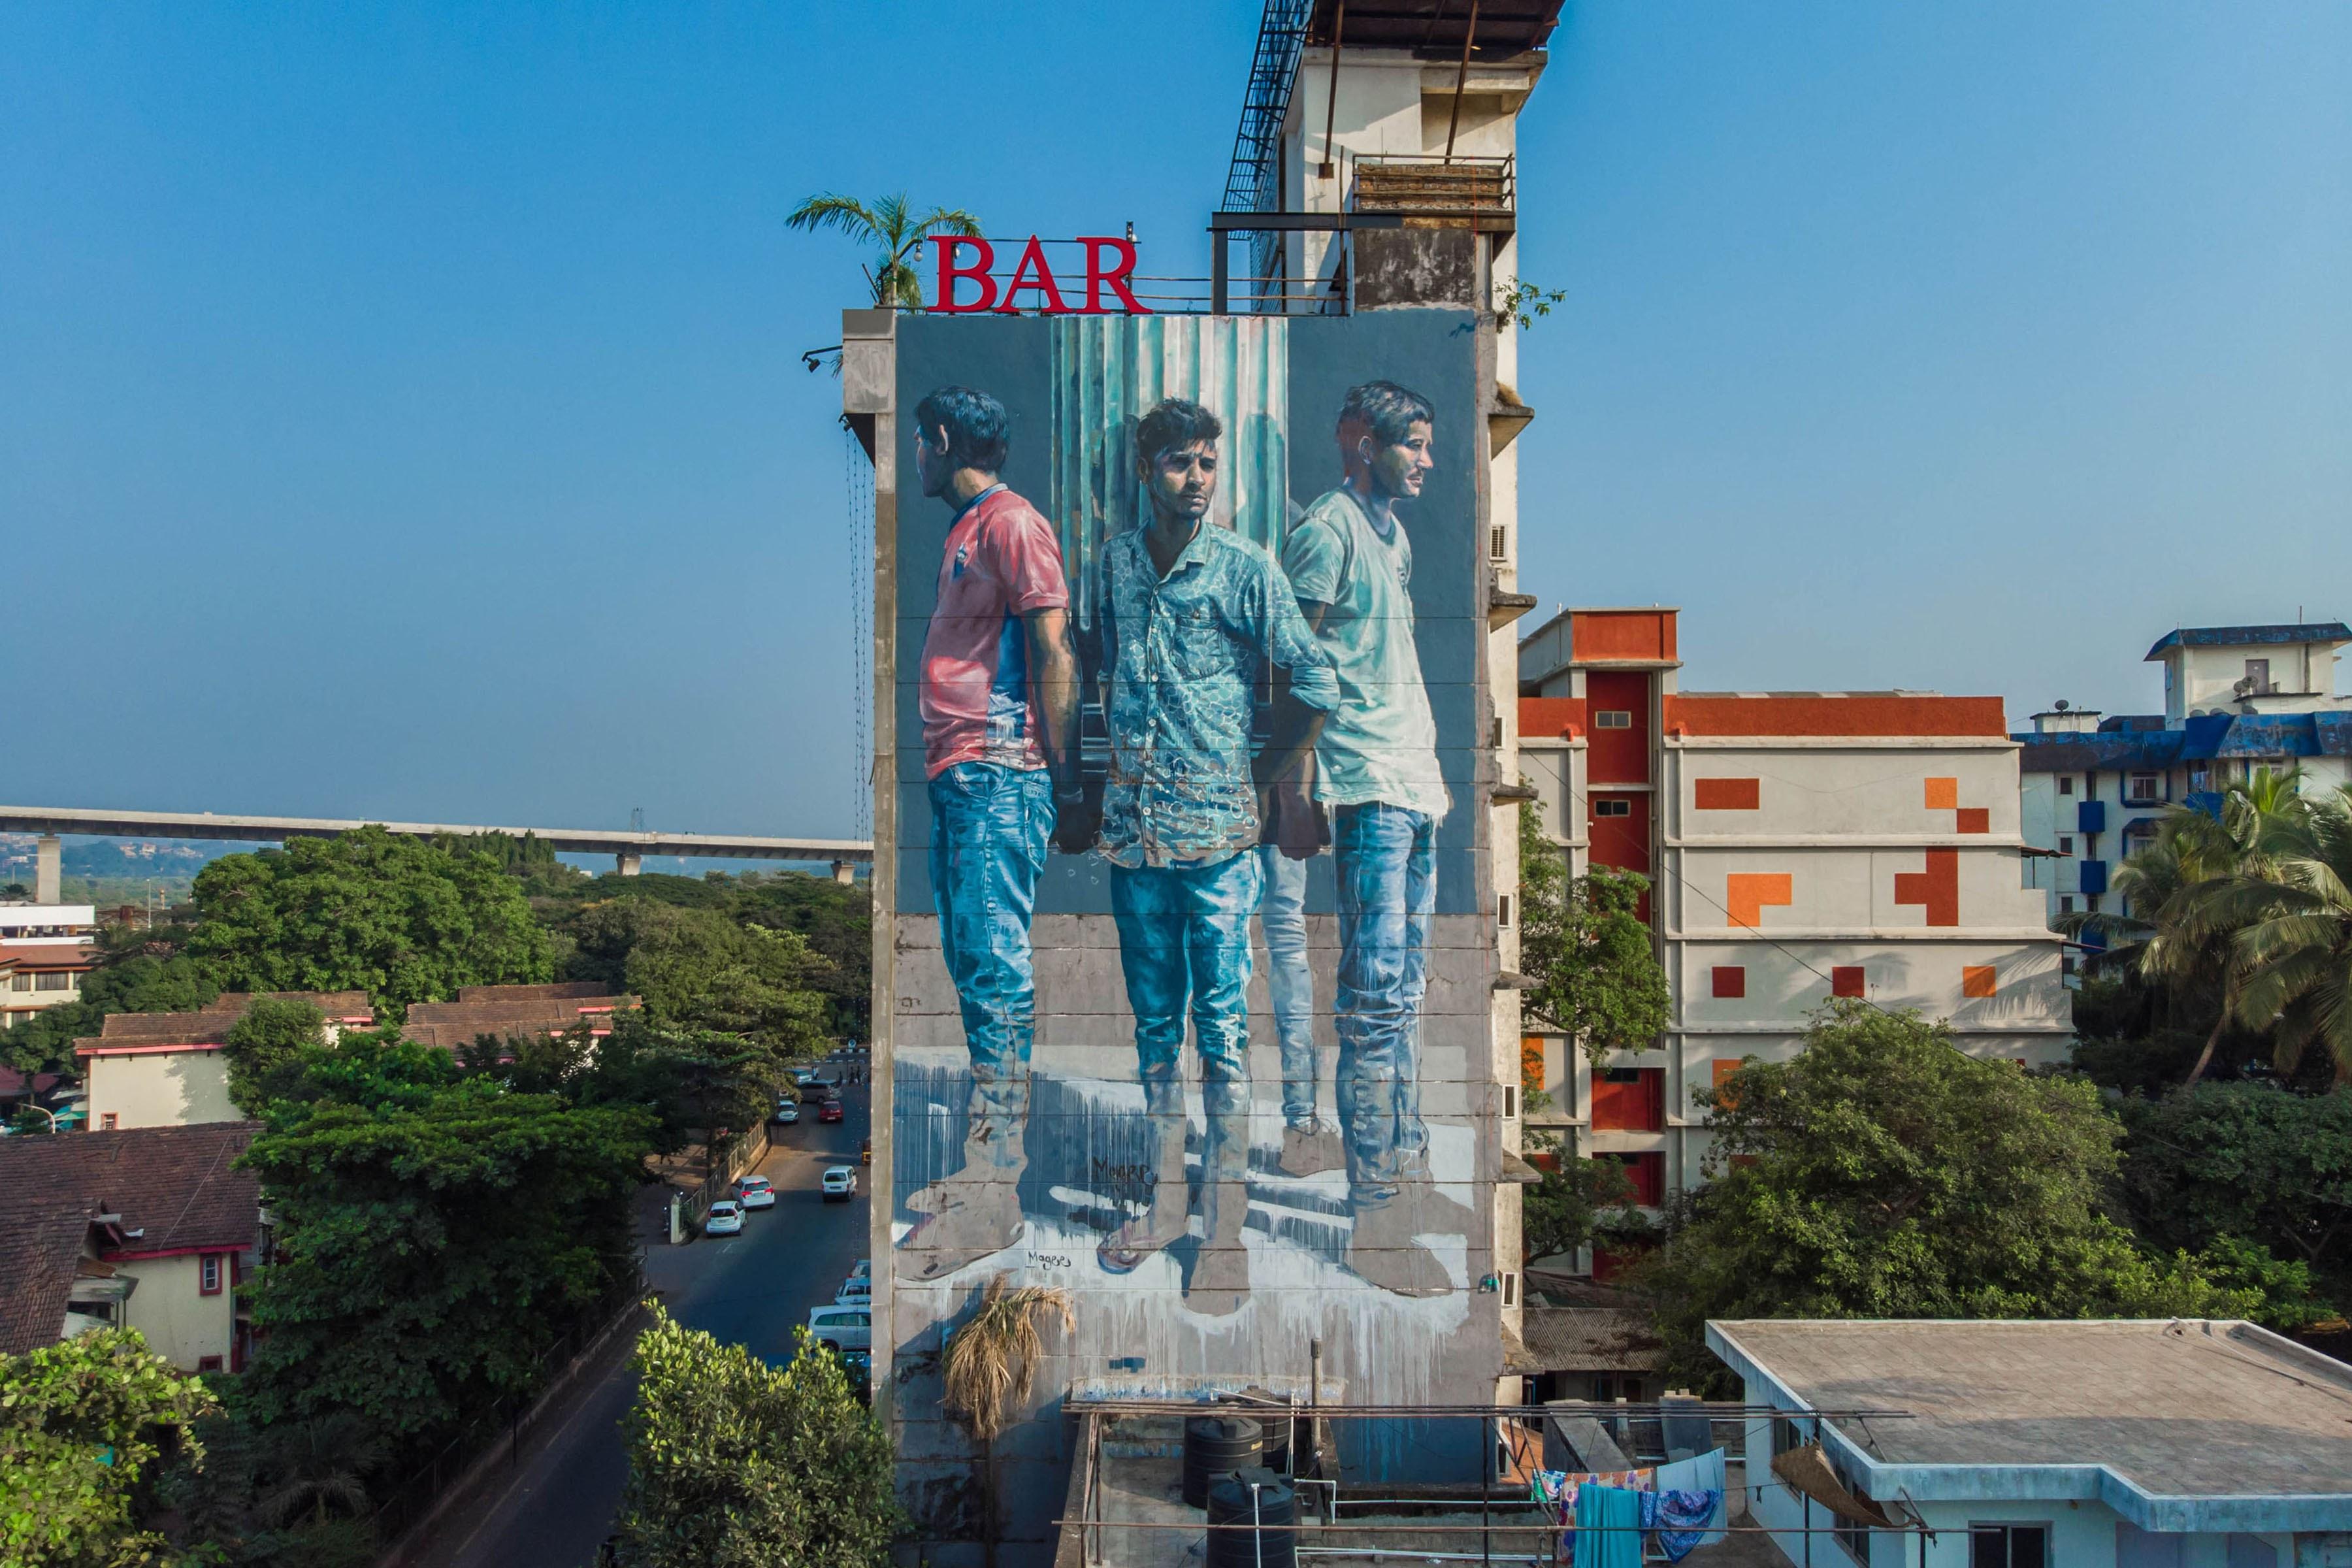 Fintan Reveals St Art Goa 2018 Pranav Gohil 2